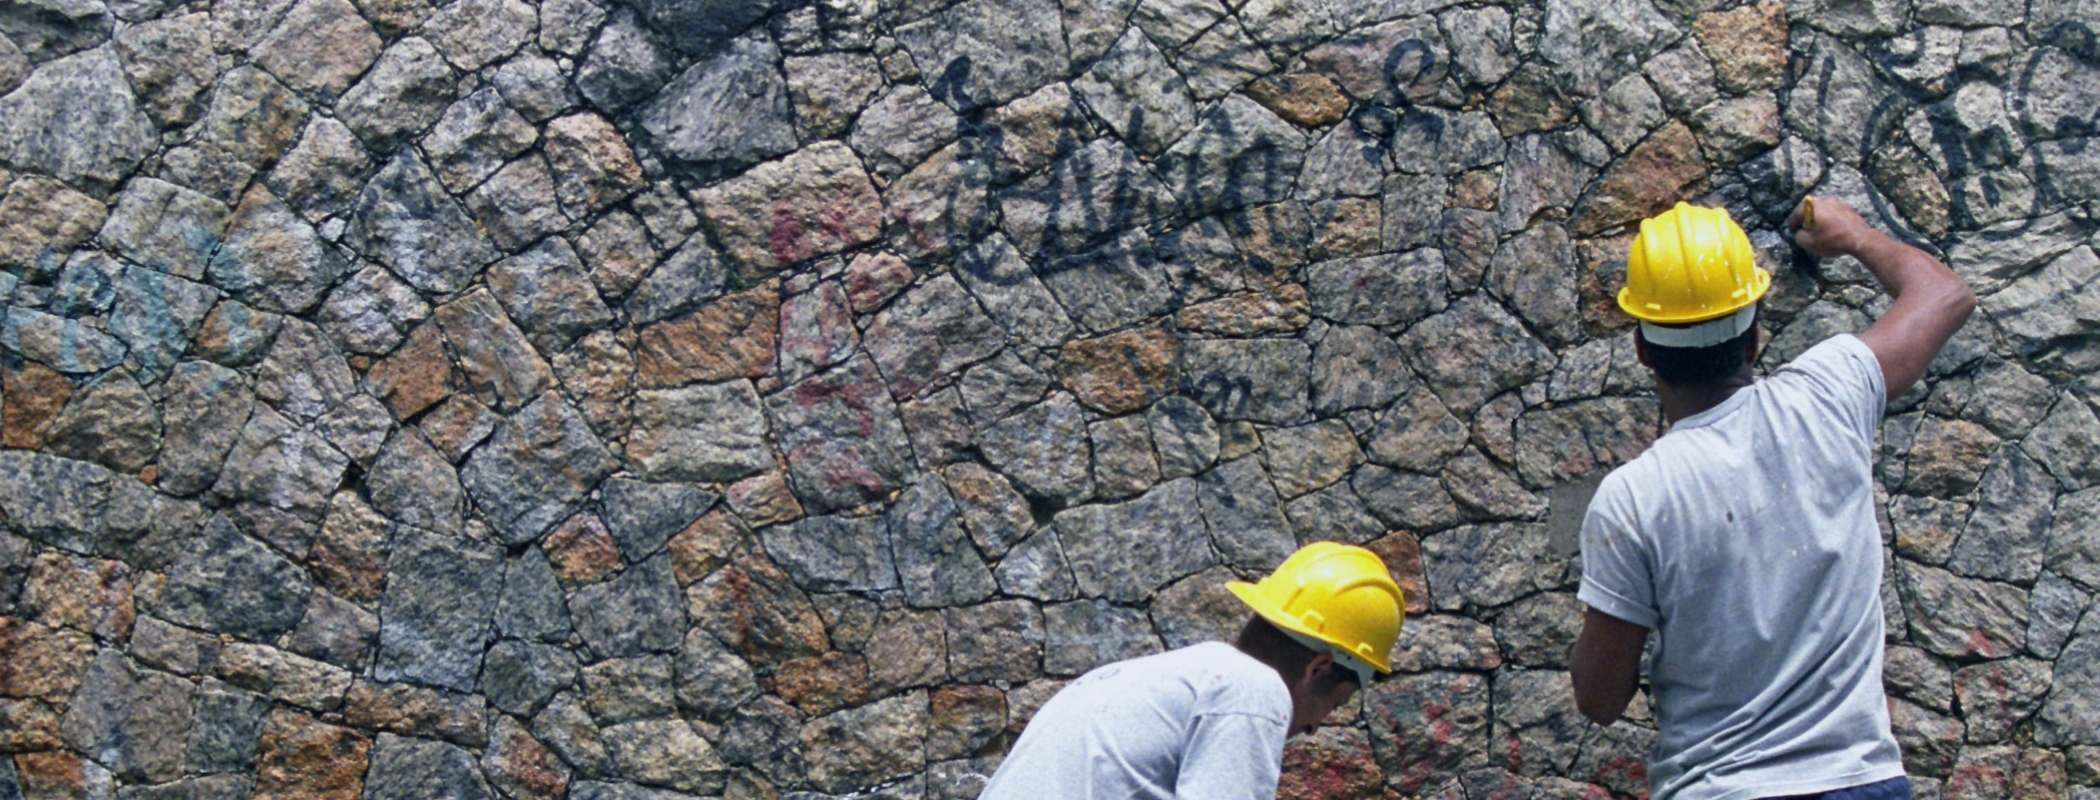 removing graffiti